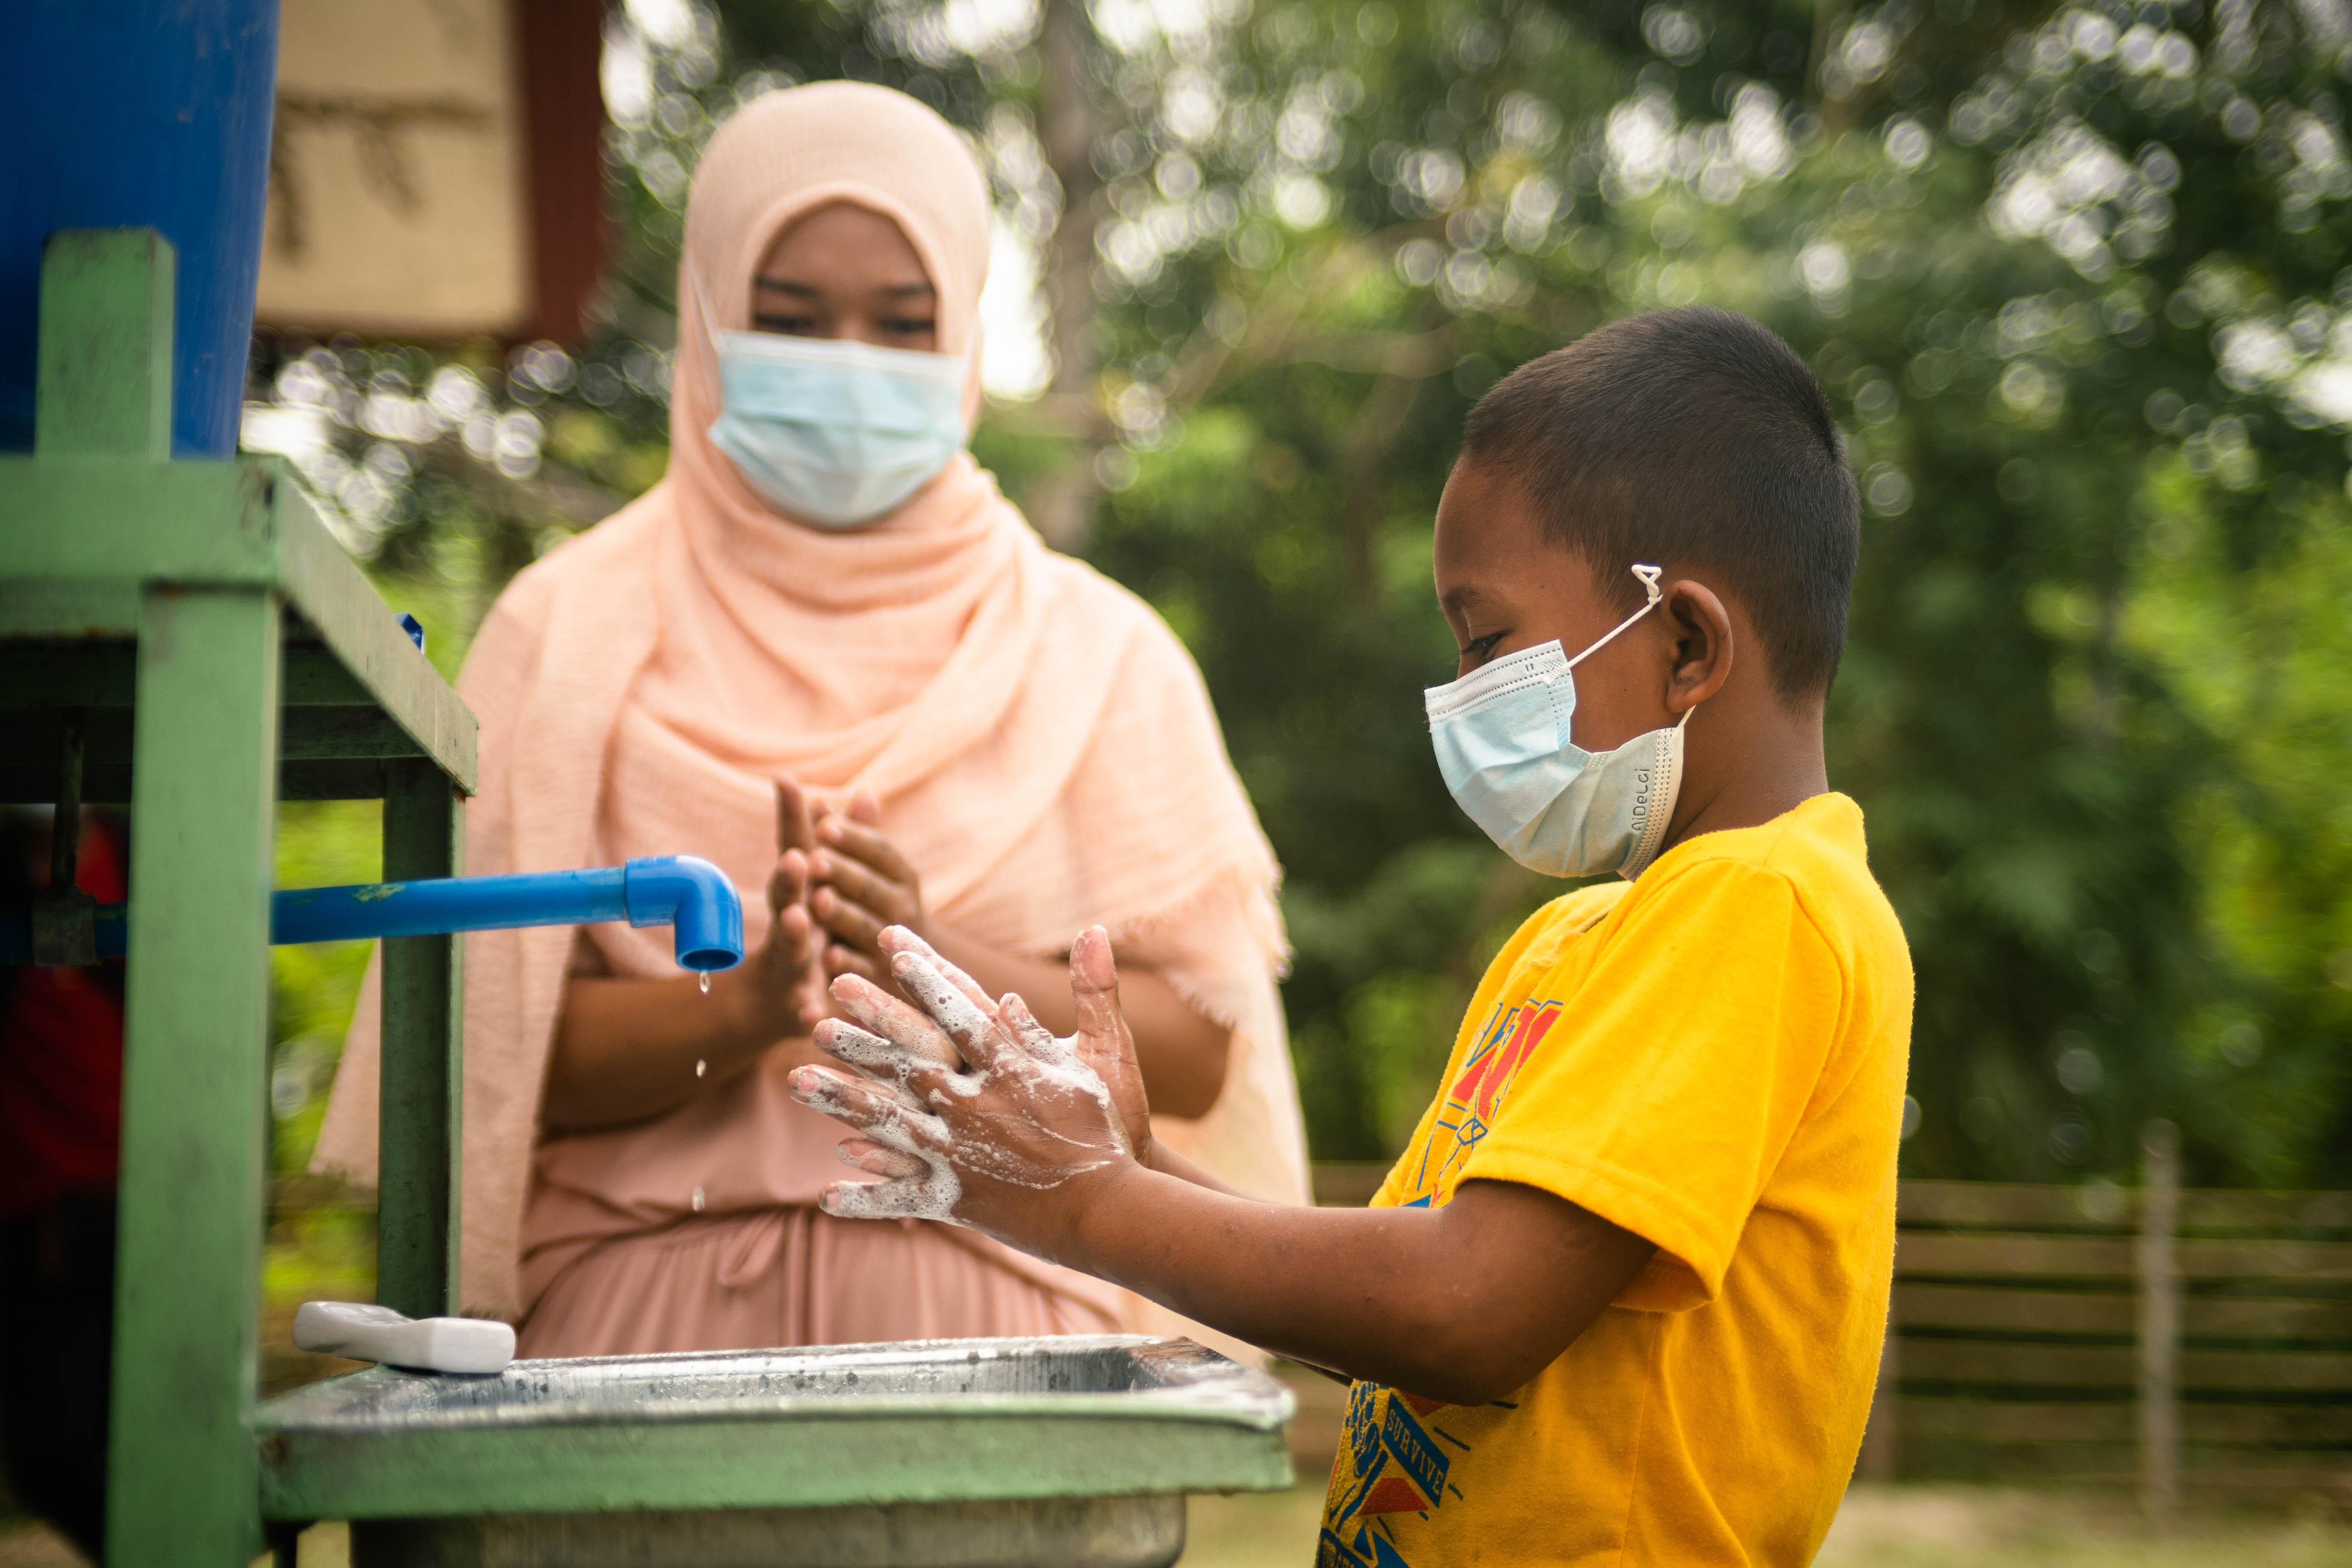 Jehana Pagabangan, one of the Mum's Magic Hands (MMH) champions, teaches Mamami Piang the proper handwashing in Sultan sa Barongis, Maguindanao. (Photo: Princess Taroza/Oxfam)